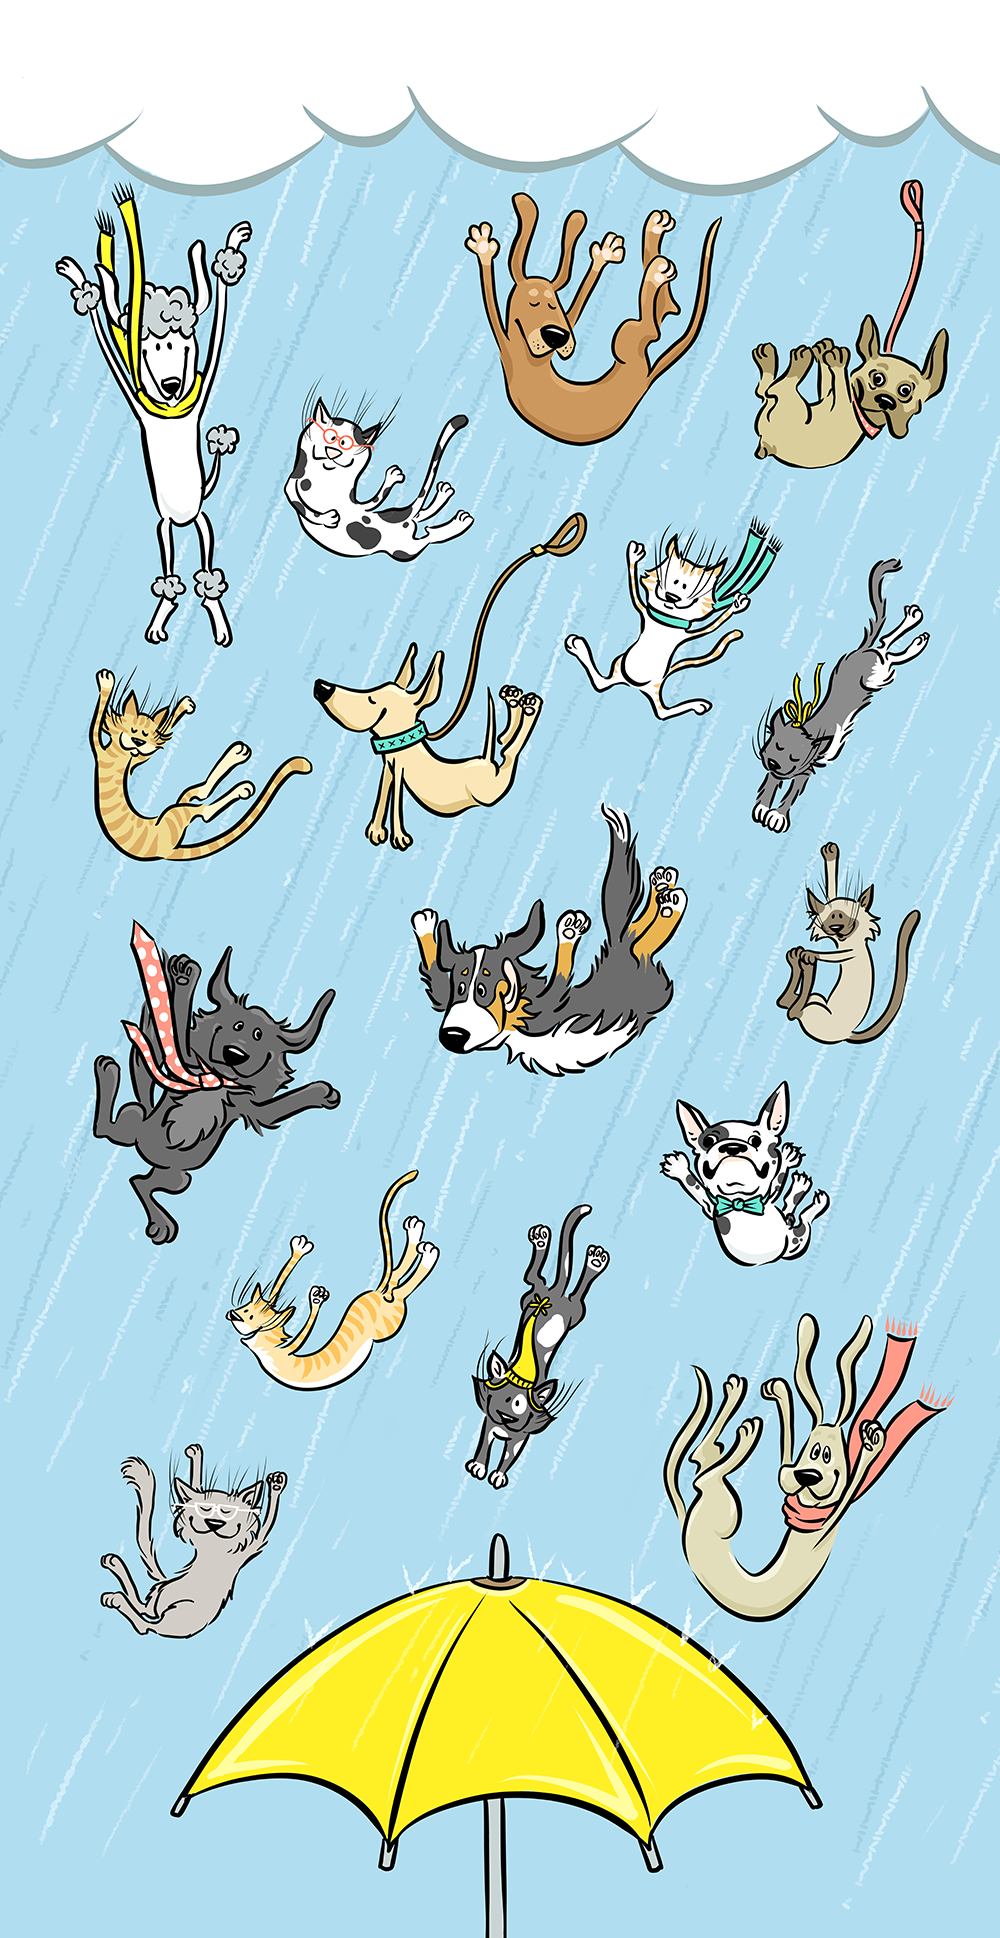 Raining-Sm.png